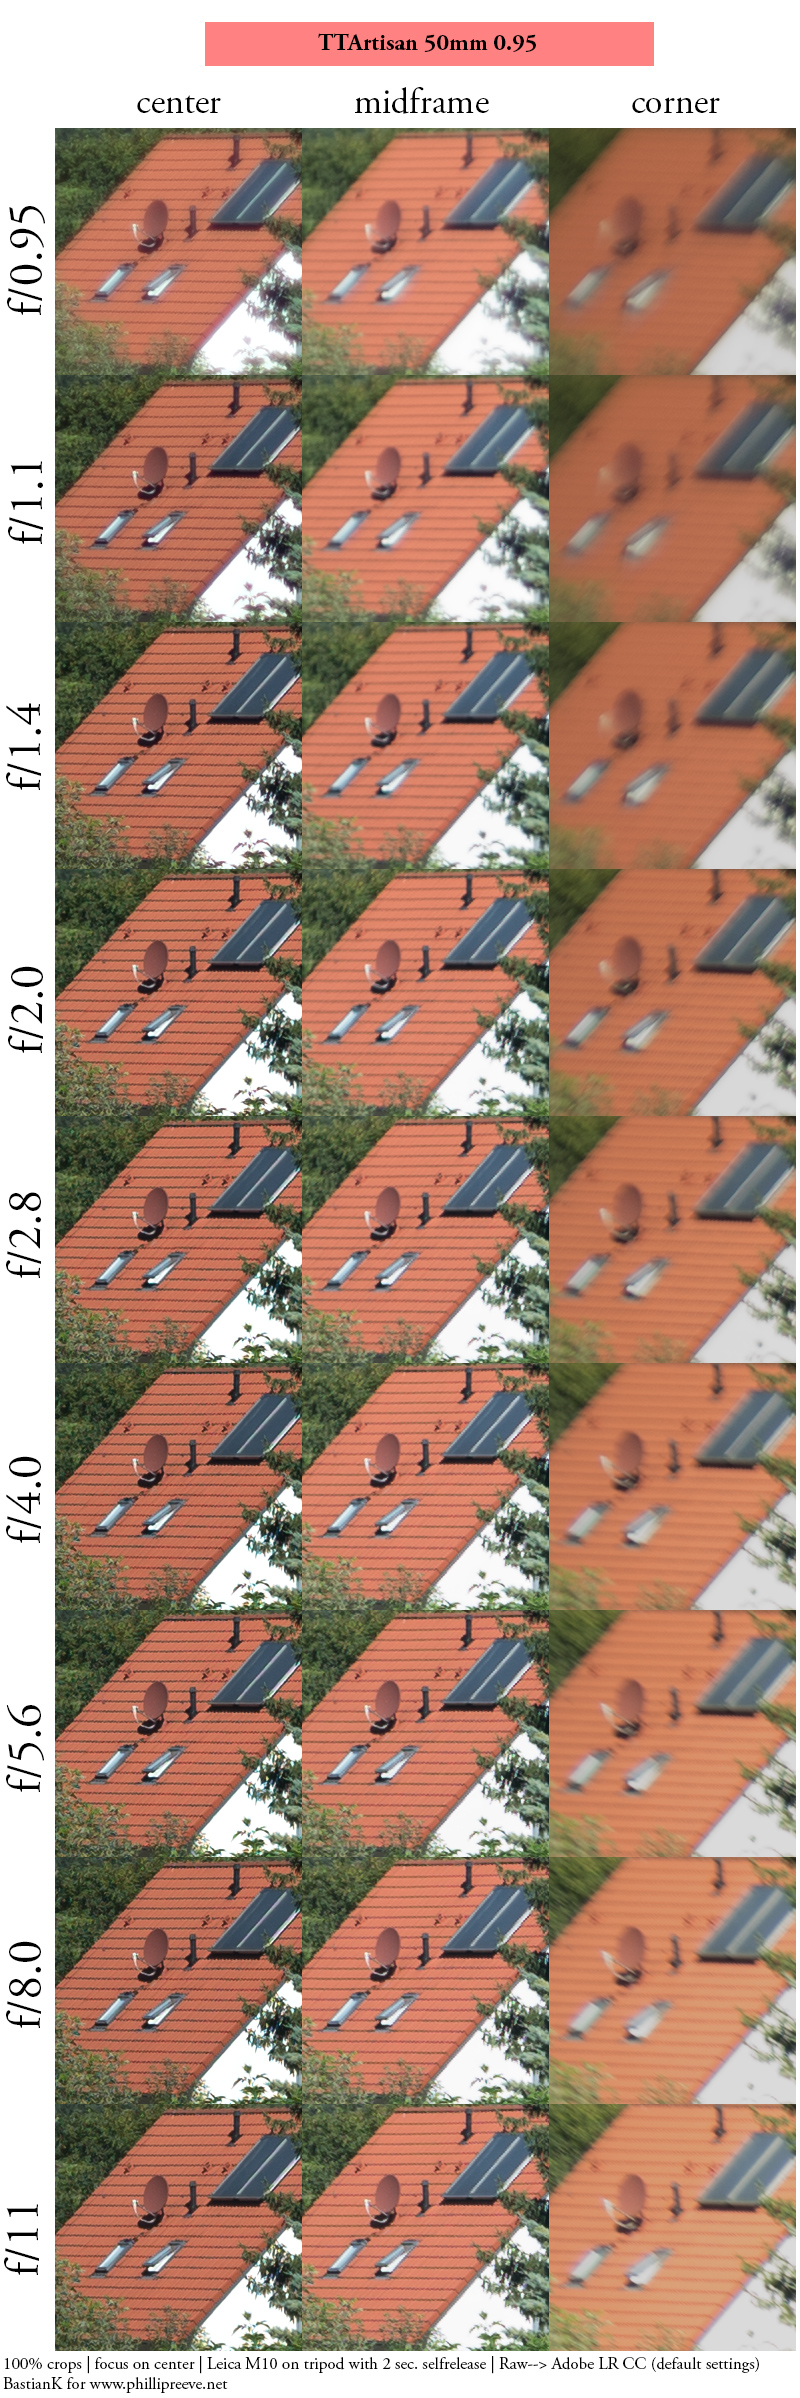 ttartisan 50mm 0.95 7artisans noctilux bokeh super fast f/0.95 portrait sharpness leica-m m10 42mp 24mp